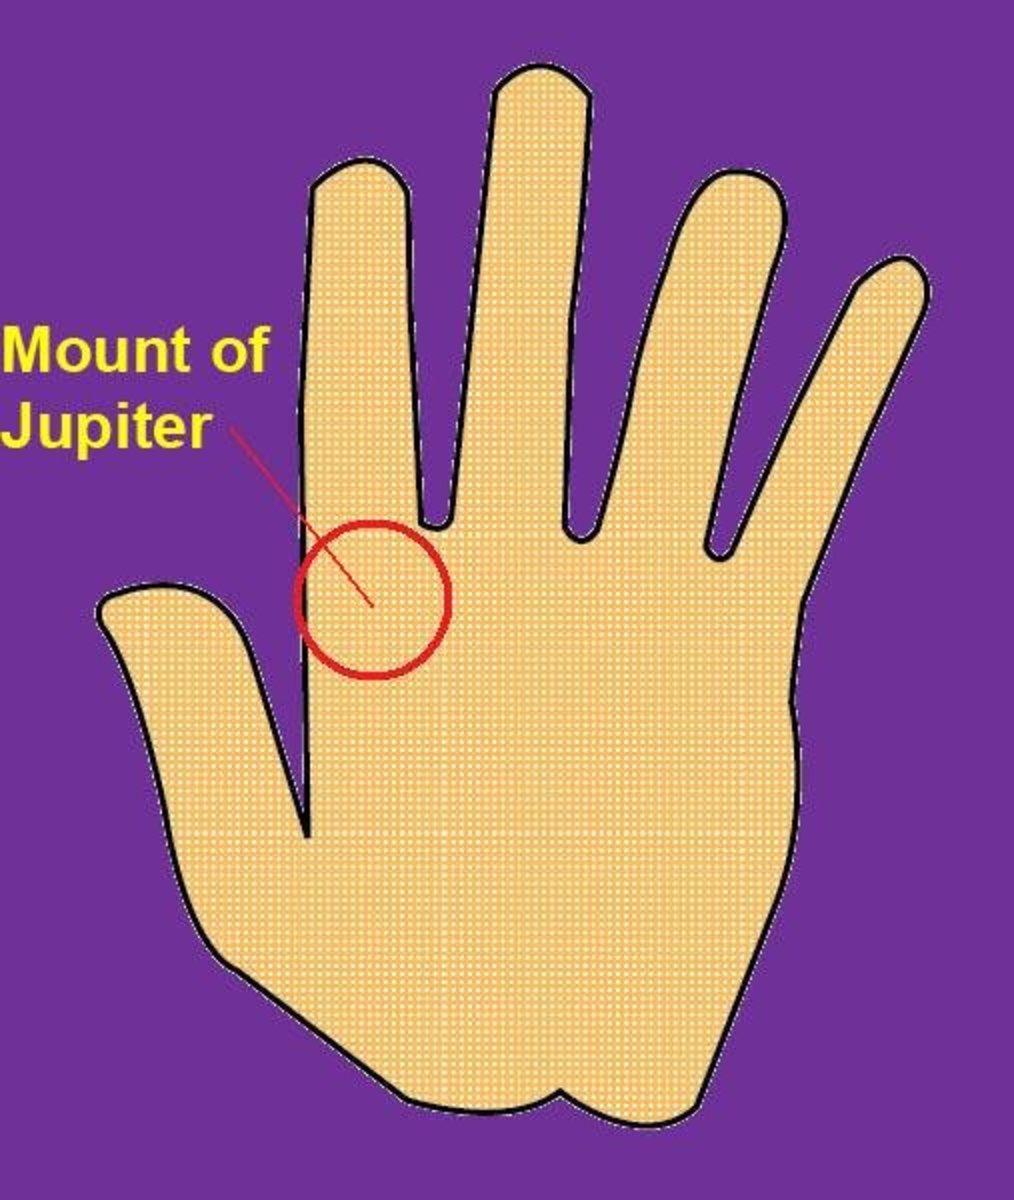 Mount of Jupiter on the Palm